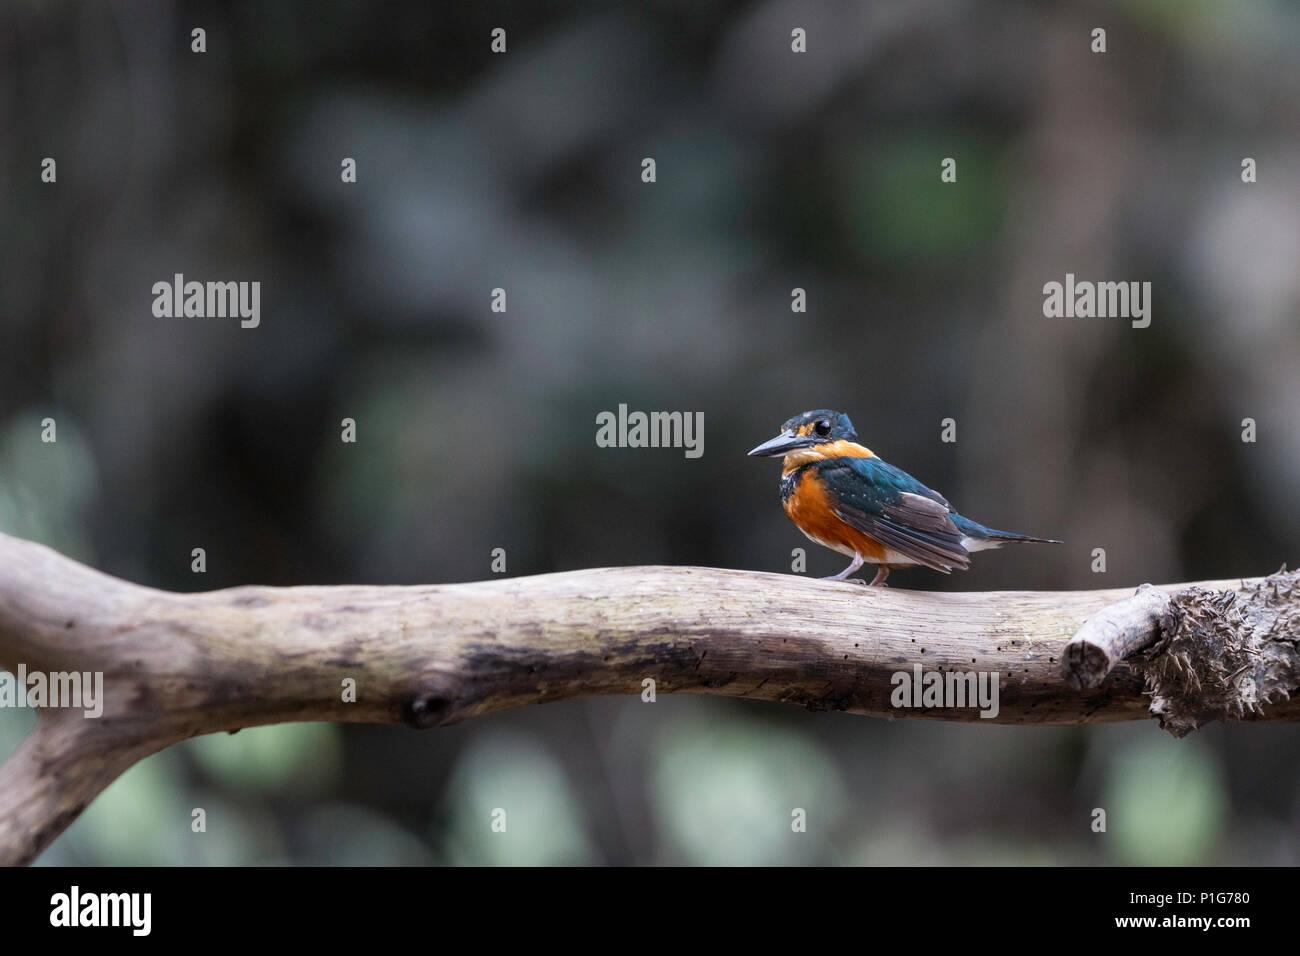 Adult American Pygmy Kingfisher, Chloroceryle aenea, Nauta Caño, Upper Amazon River Basin, Loreto, Peru - Stock Image